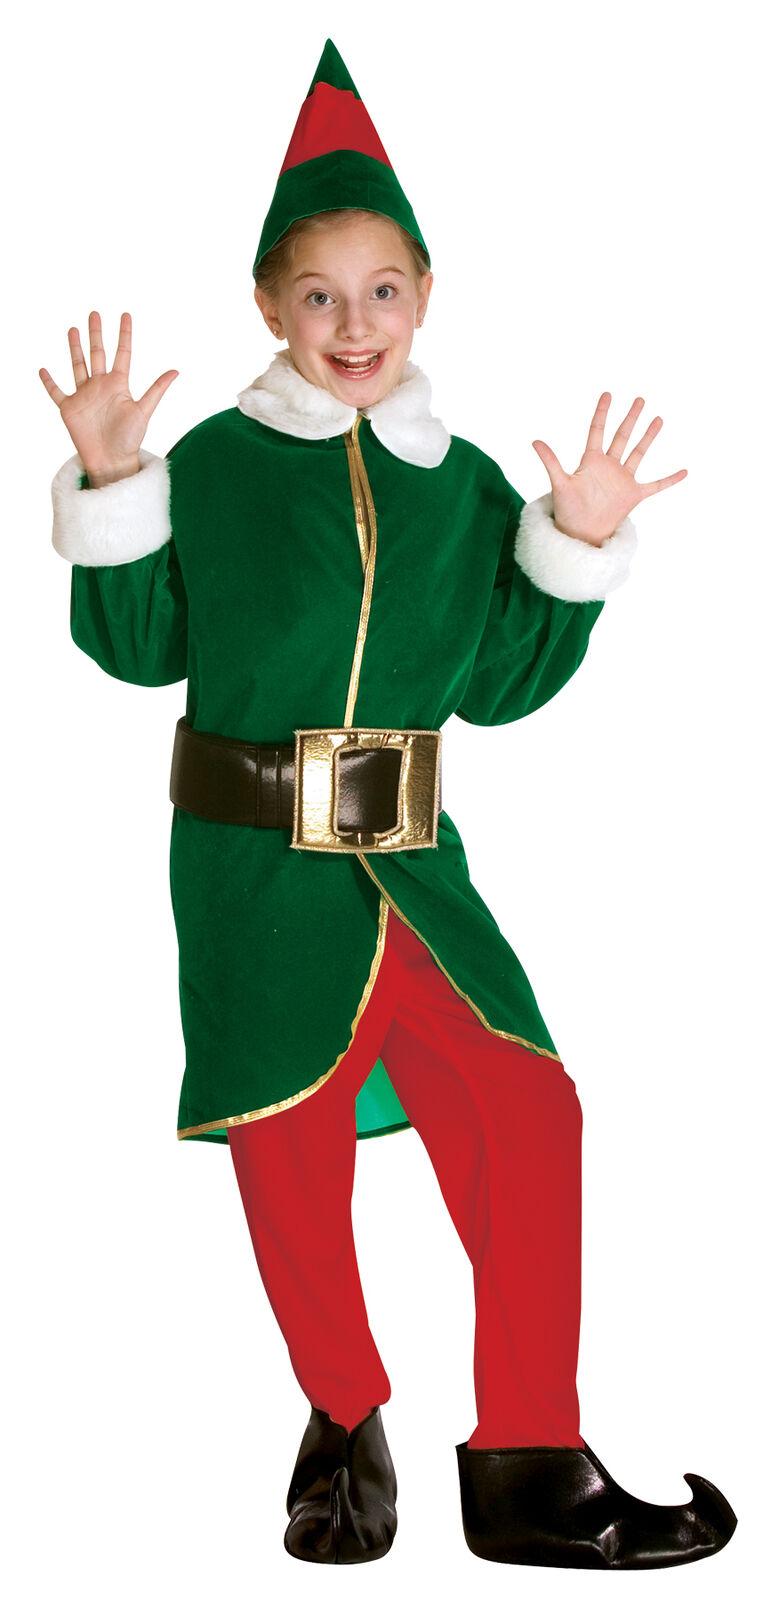 Elf Child Green Red Christmas Costume Velvet Jacket With White Trim Fancy Dress